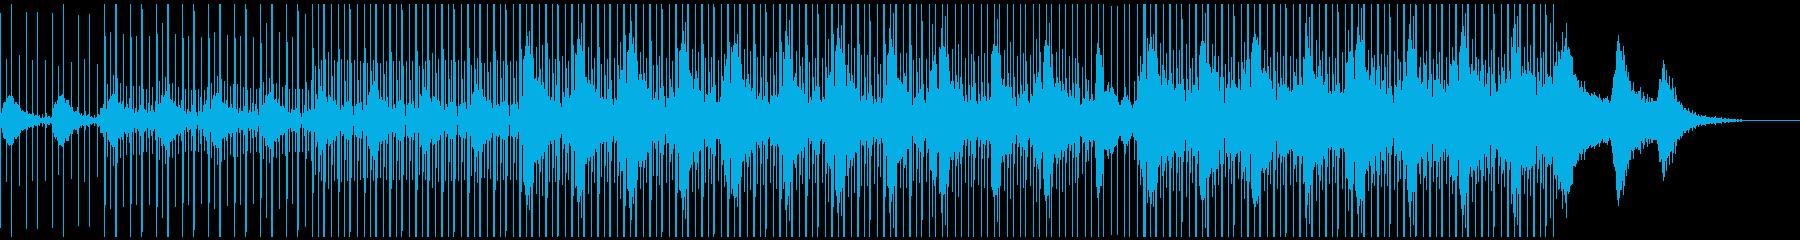 Boards of Canada風BGMの再生済みの波形